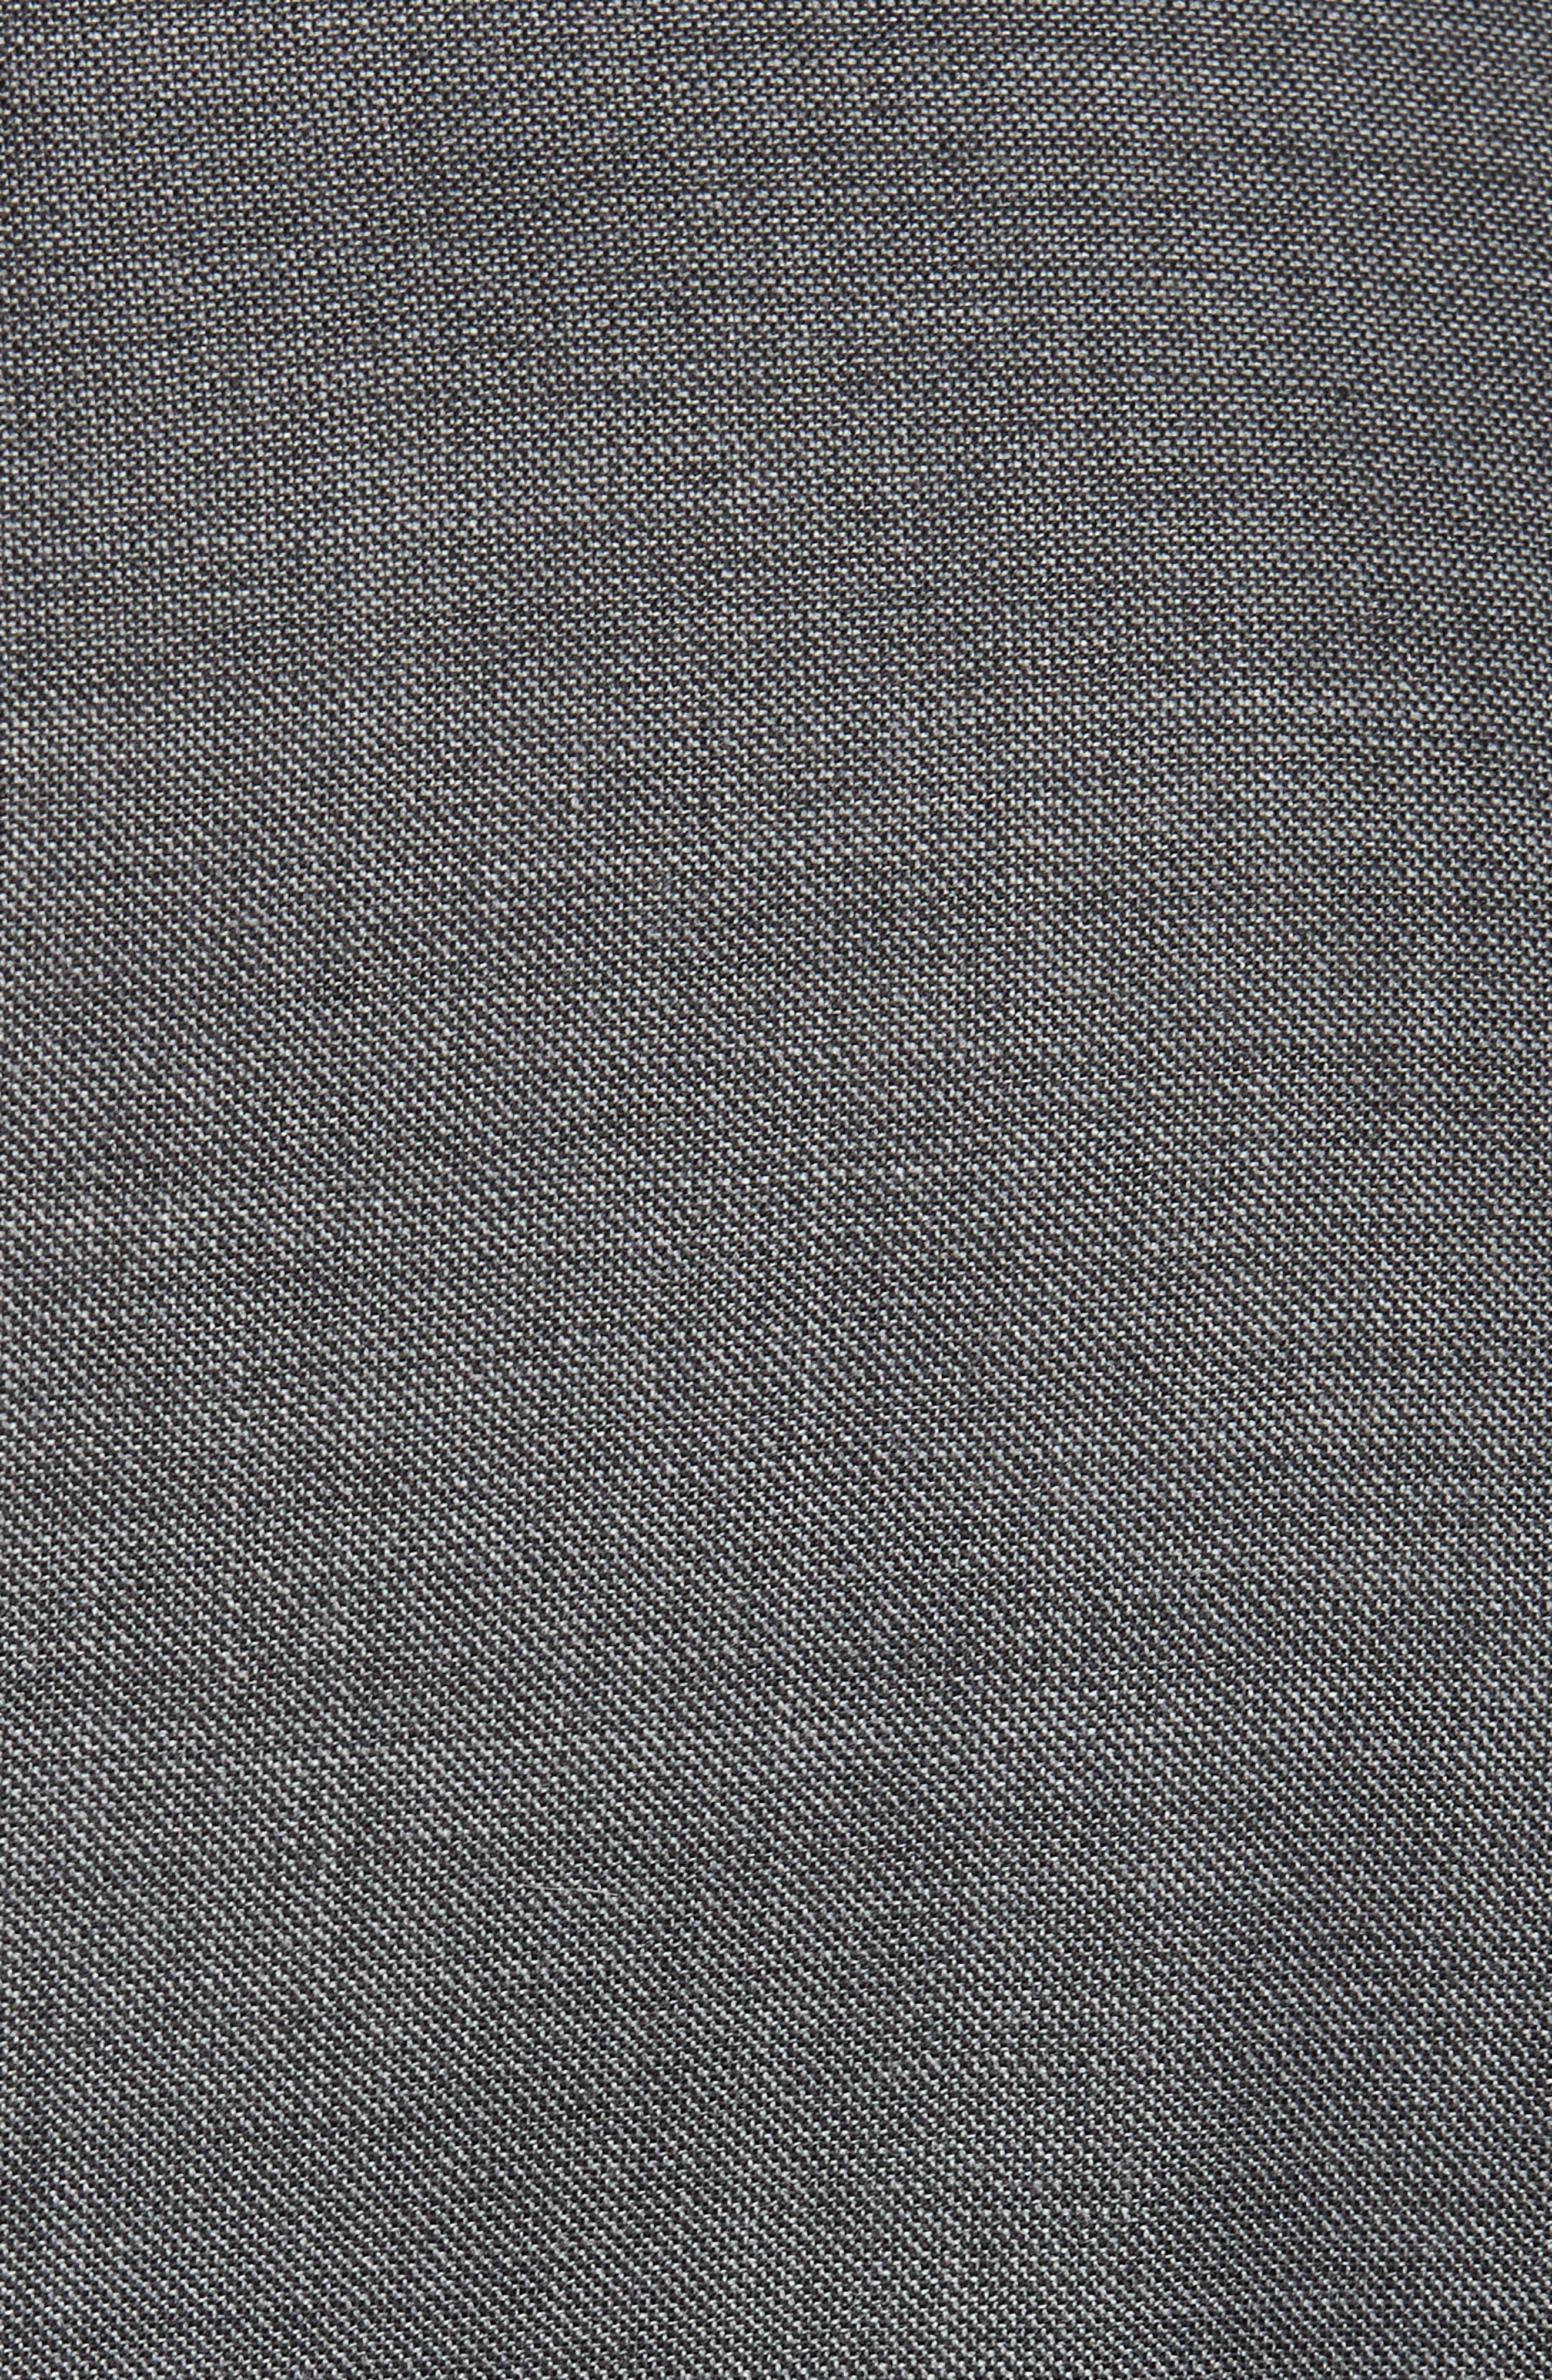 Trim Fit Sharkskin Wool Suit,                             Alternate thumbnail 6, color,                             MID GREY